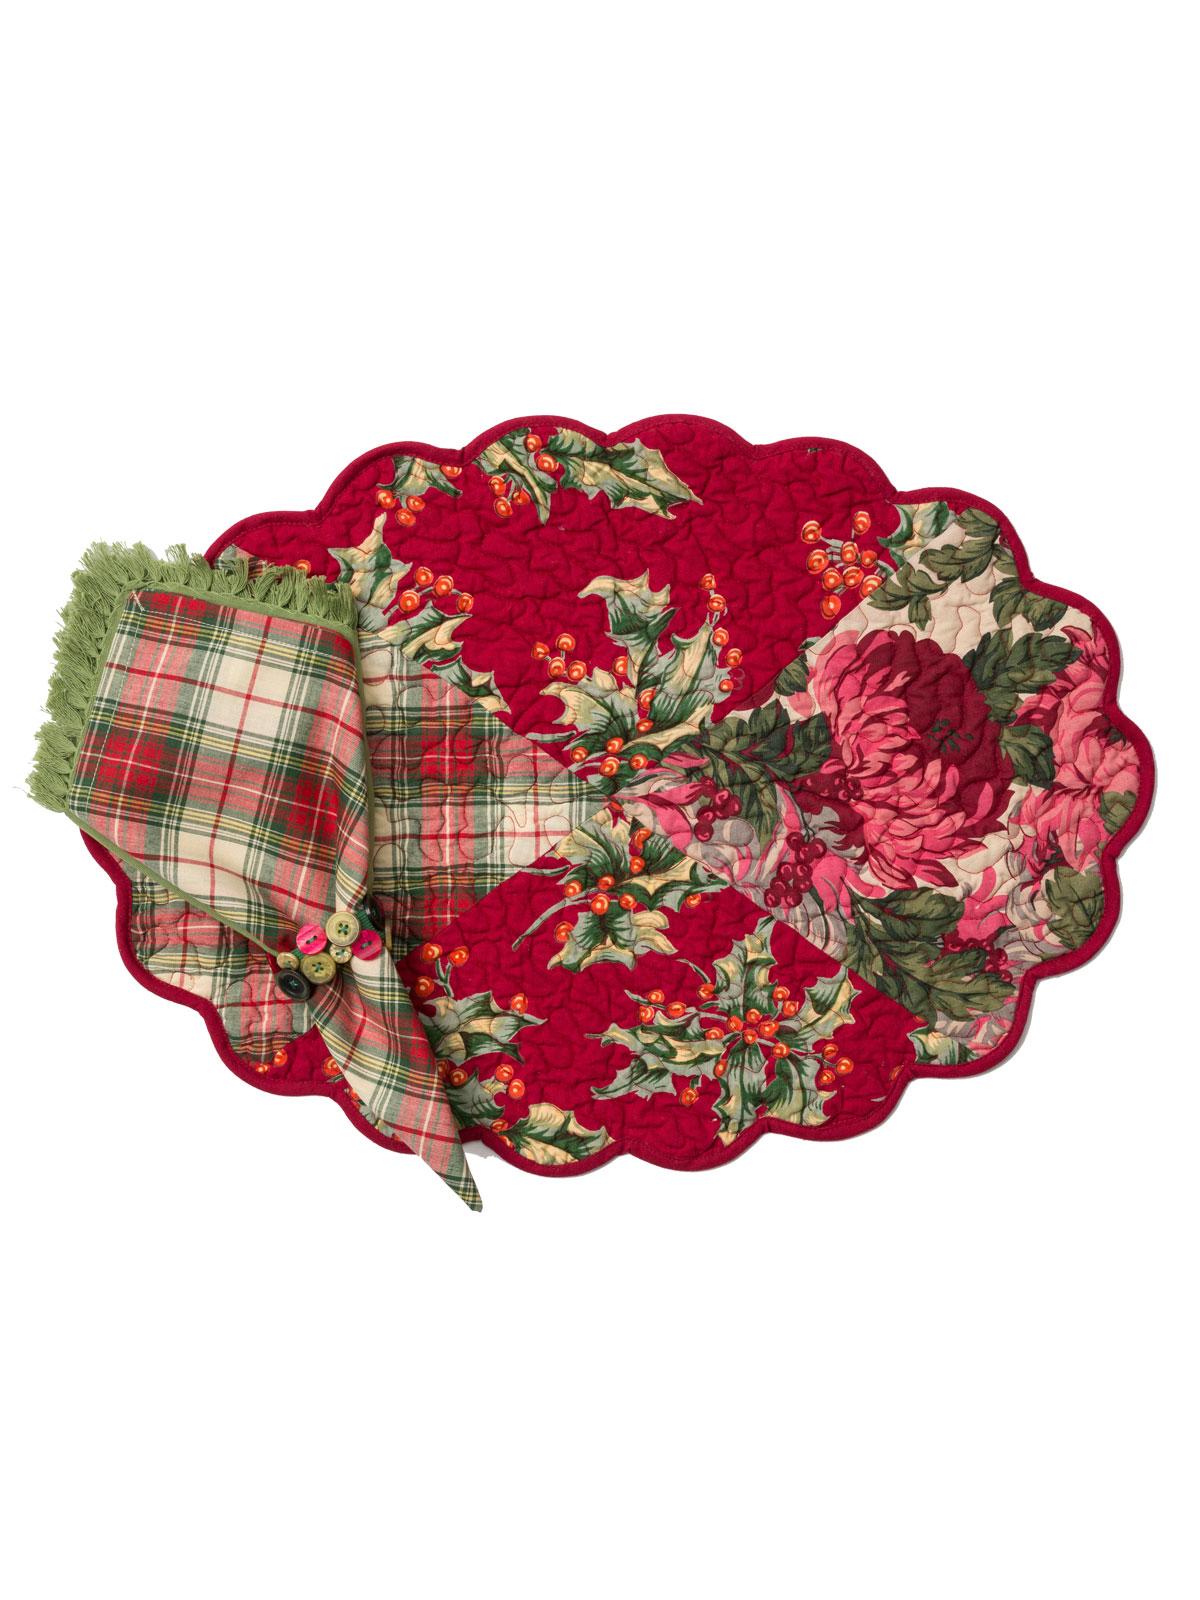 Christmas Patchwork Tablecloth Attic Sale Linens